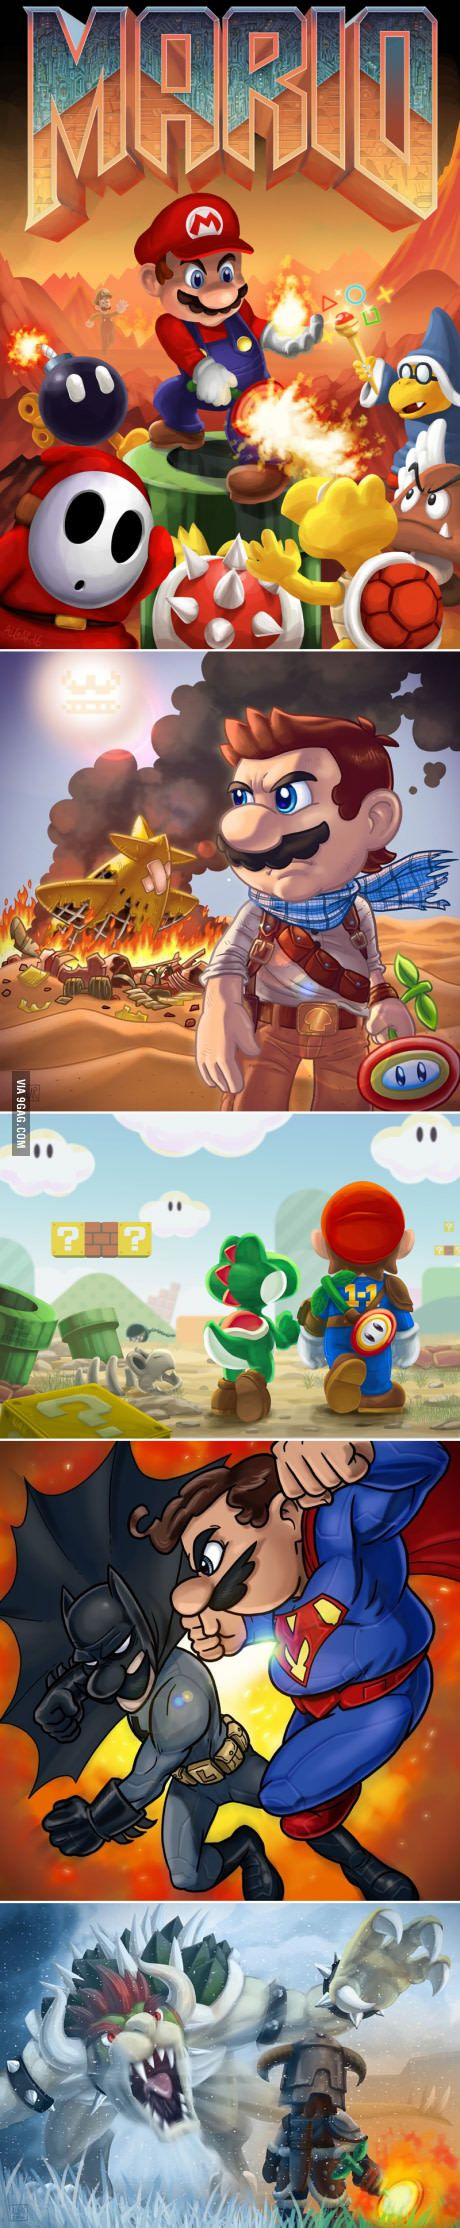 Mario is everywhere.